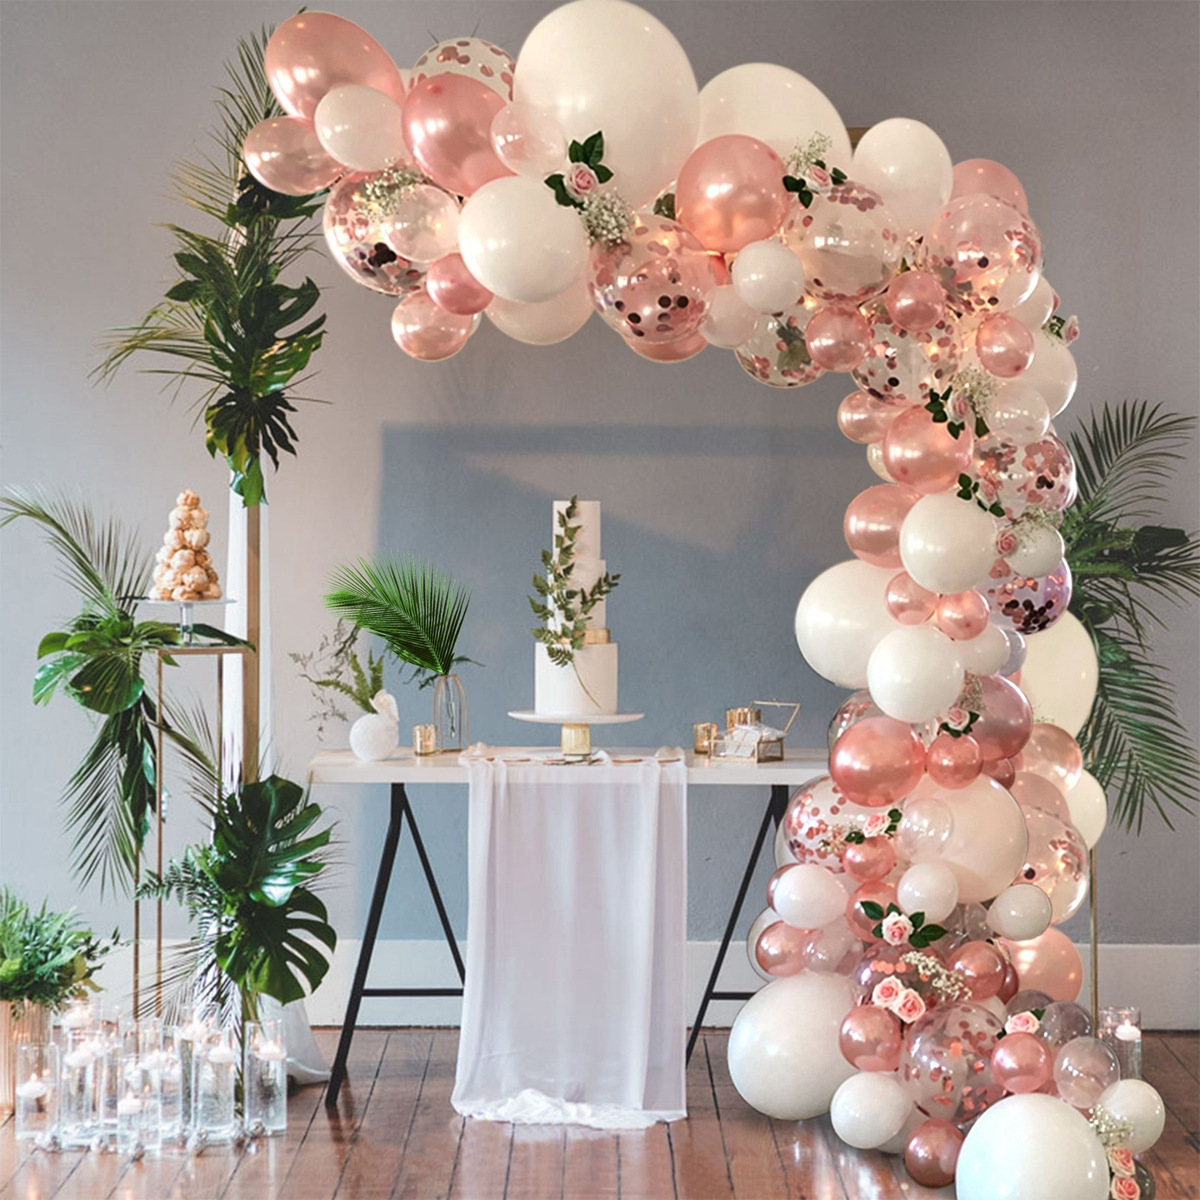 Macaron Pink Balloon Garland Arch Kit Wedding Birthday Party Decoration Kids Globos Rose Gold Confetti Latex Ballon Baby Shower 3